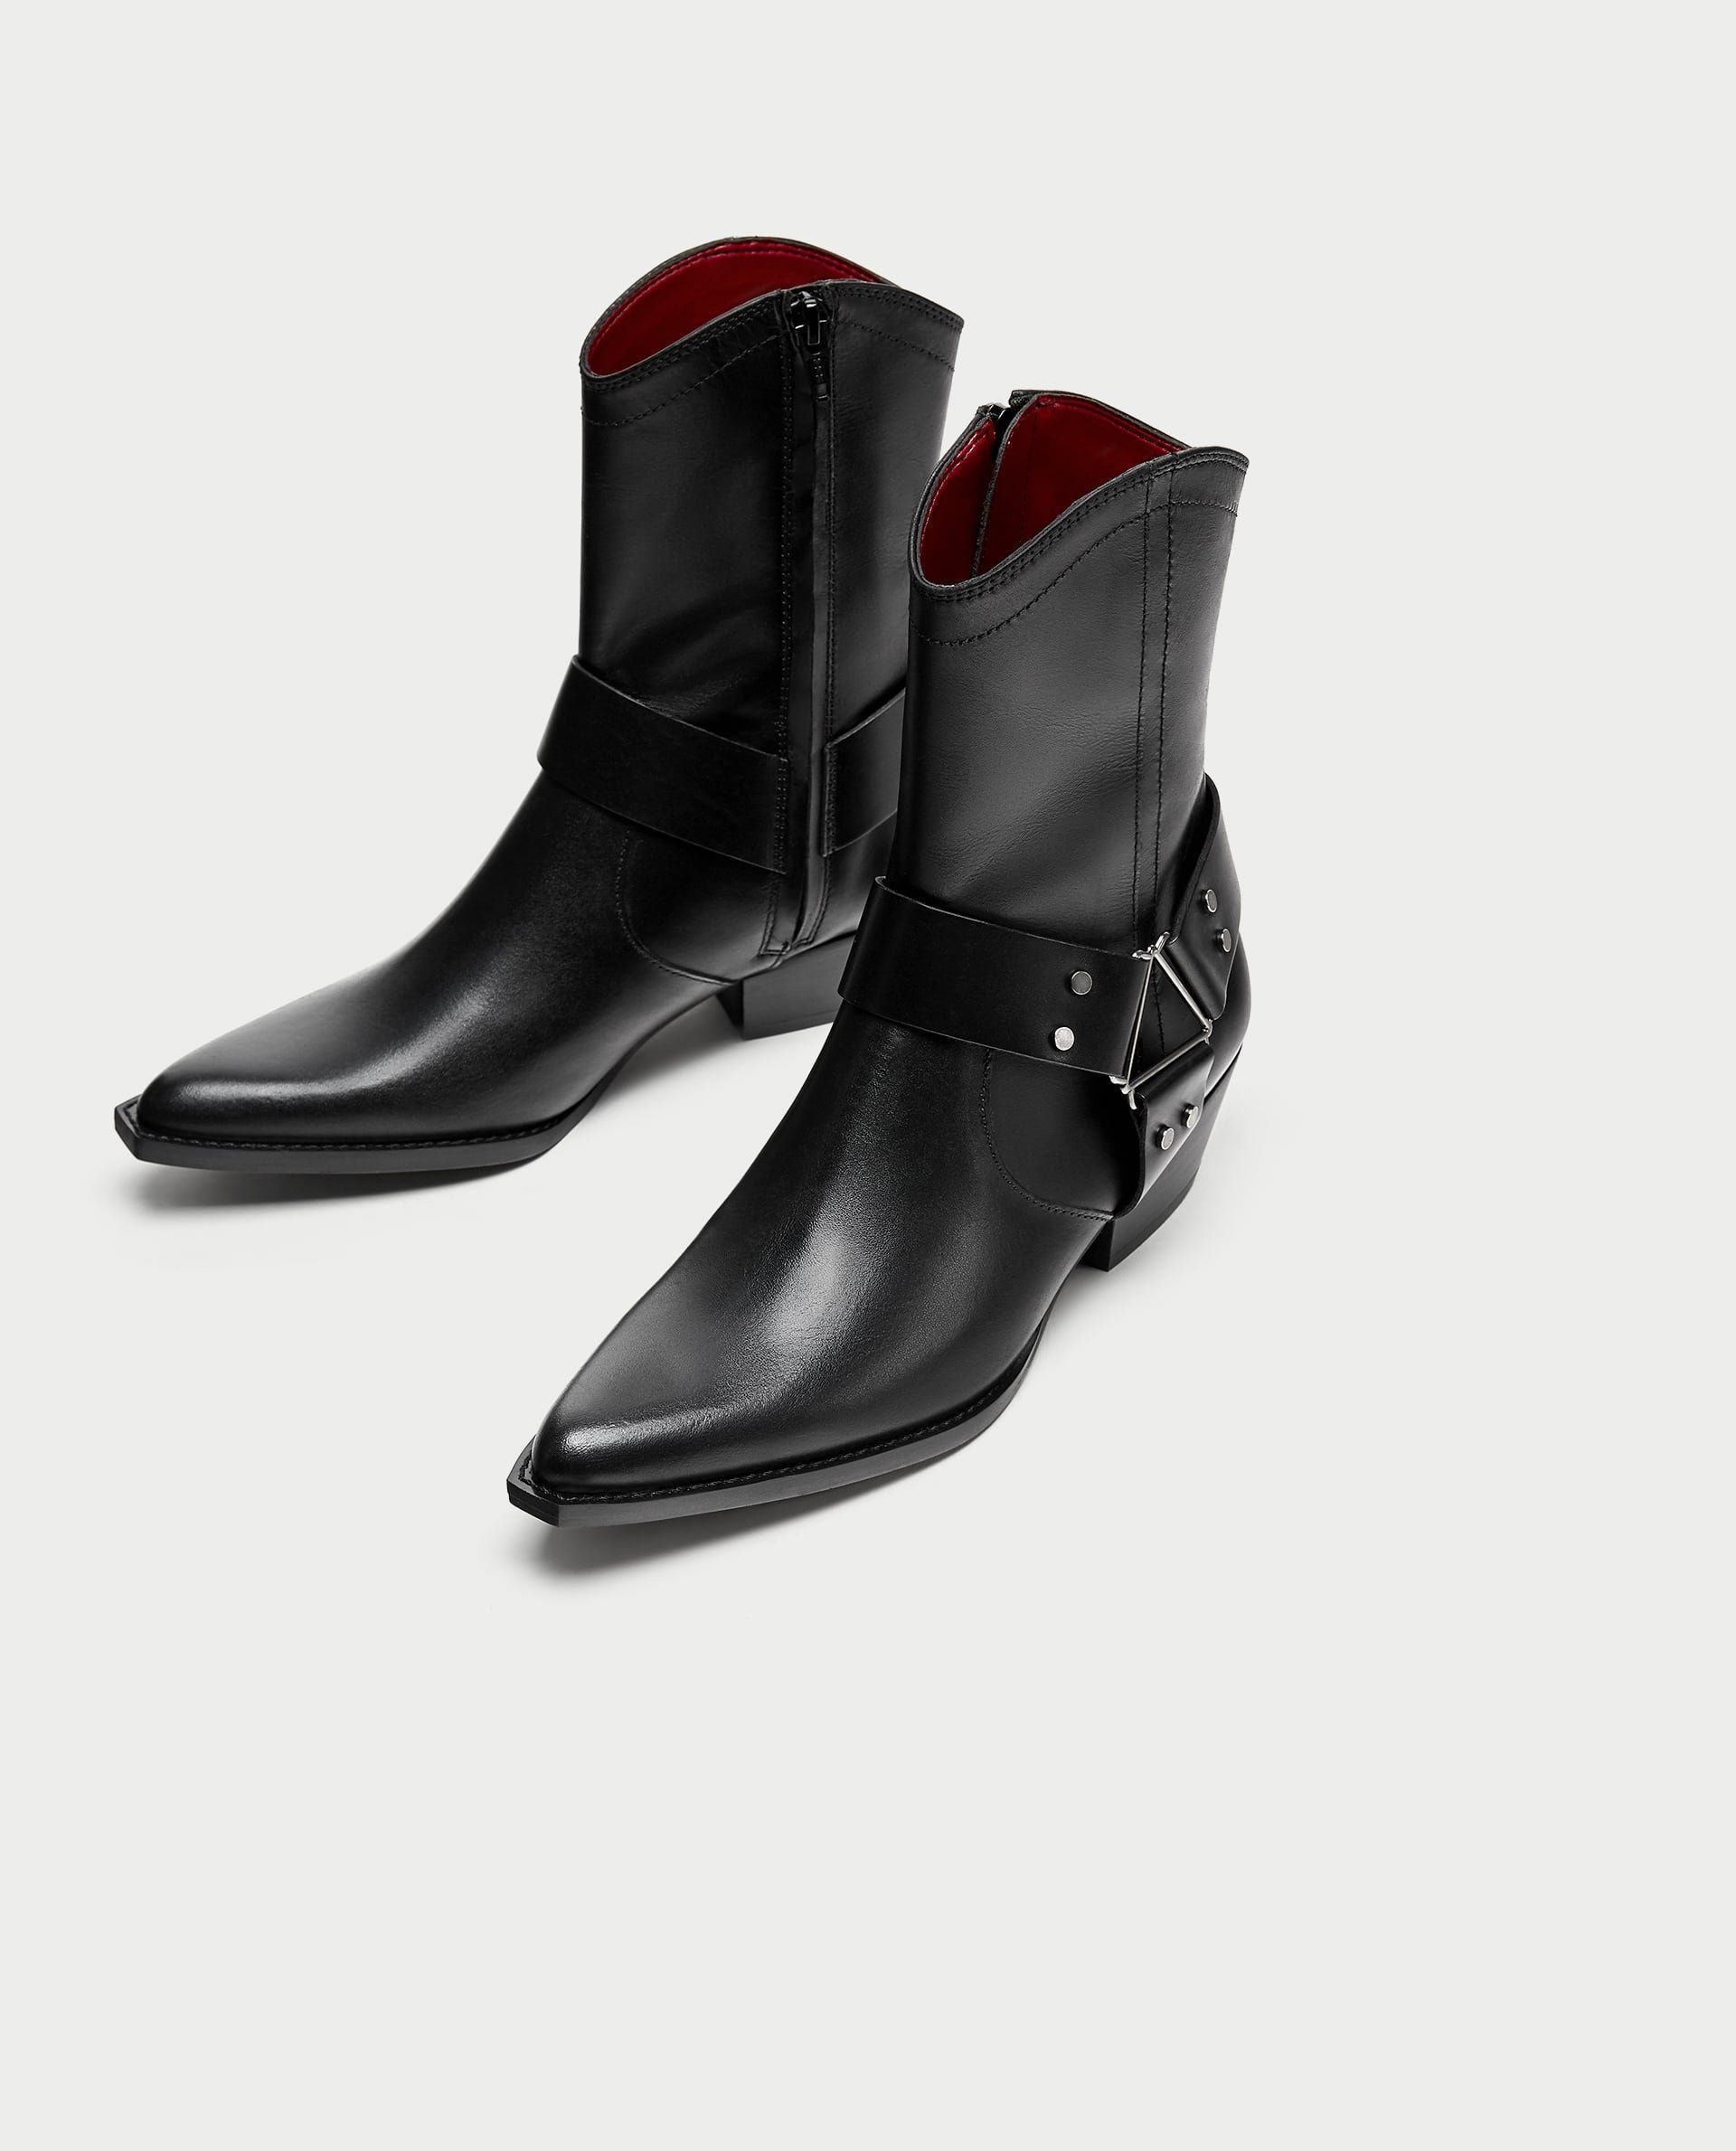 af8d9ec6560 Zara Leather Cowboy Boots | Zara women | Shoe boots, Boots, Ankle boots